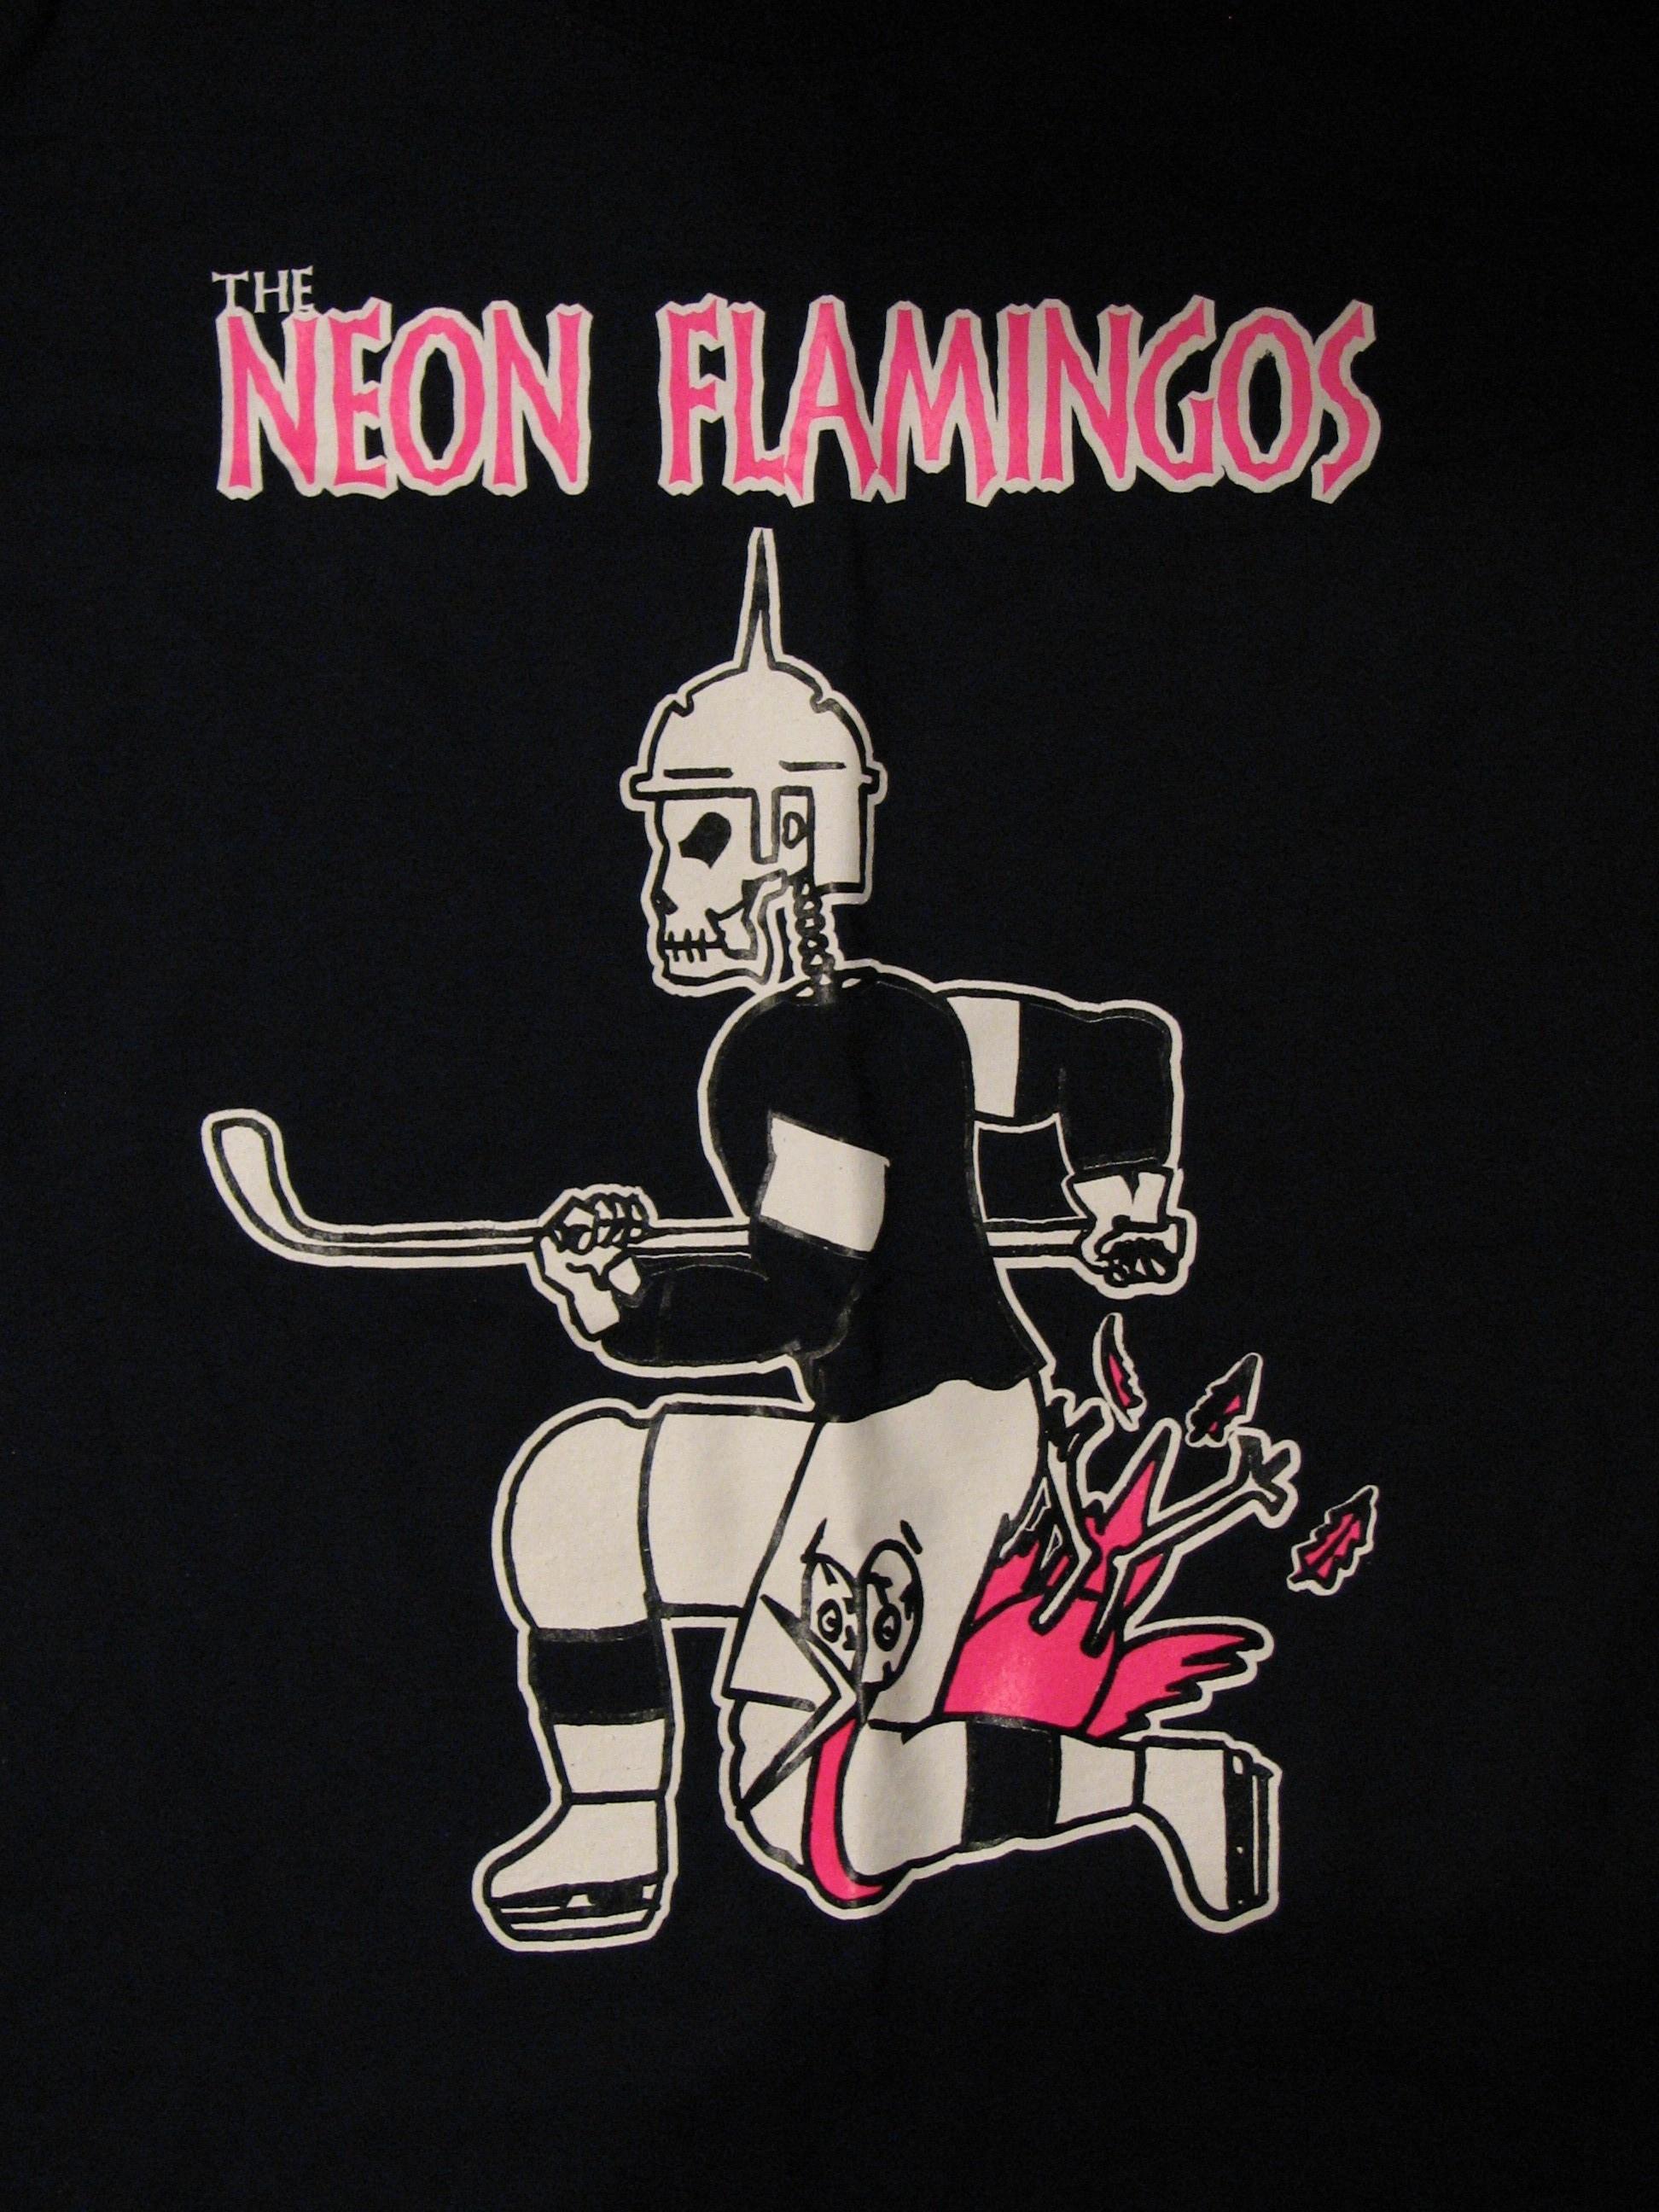 theNeonFlamingos